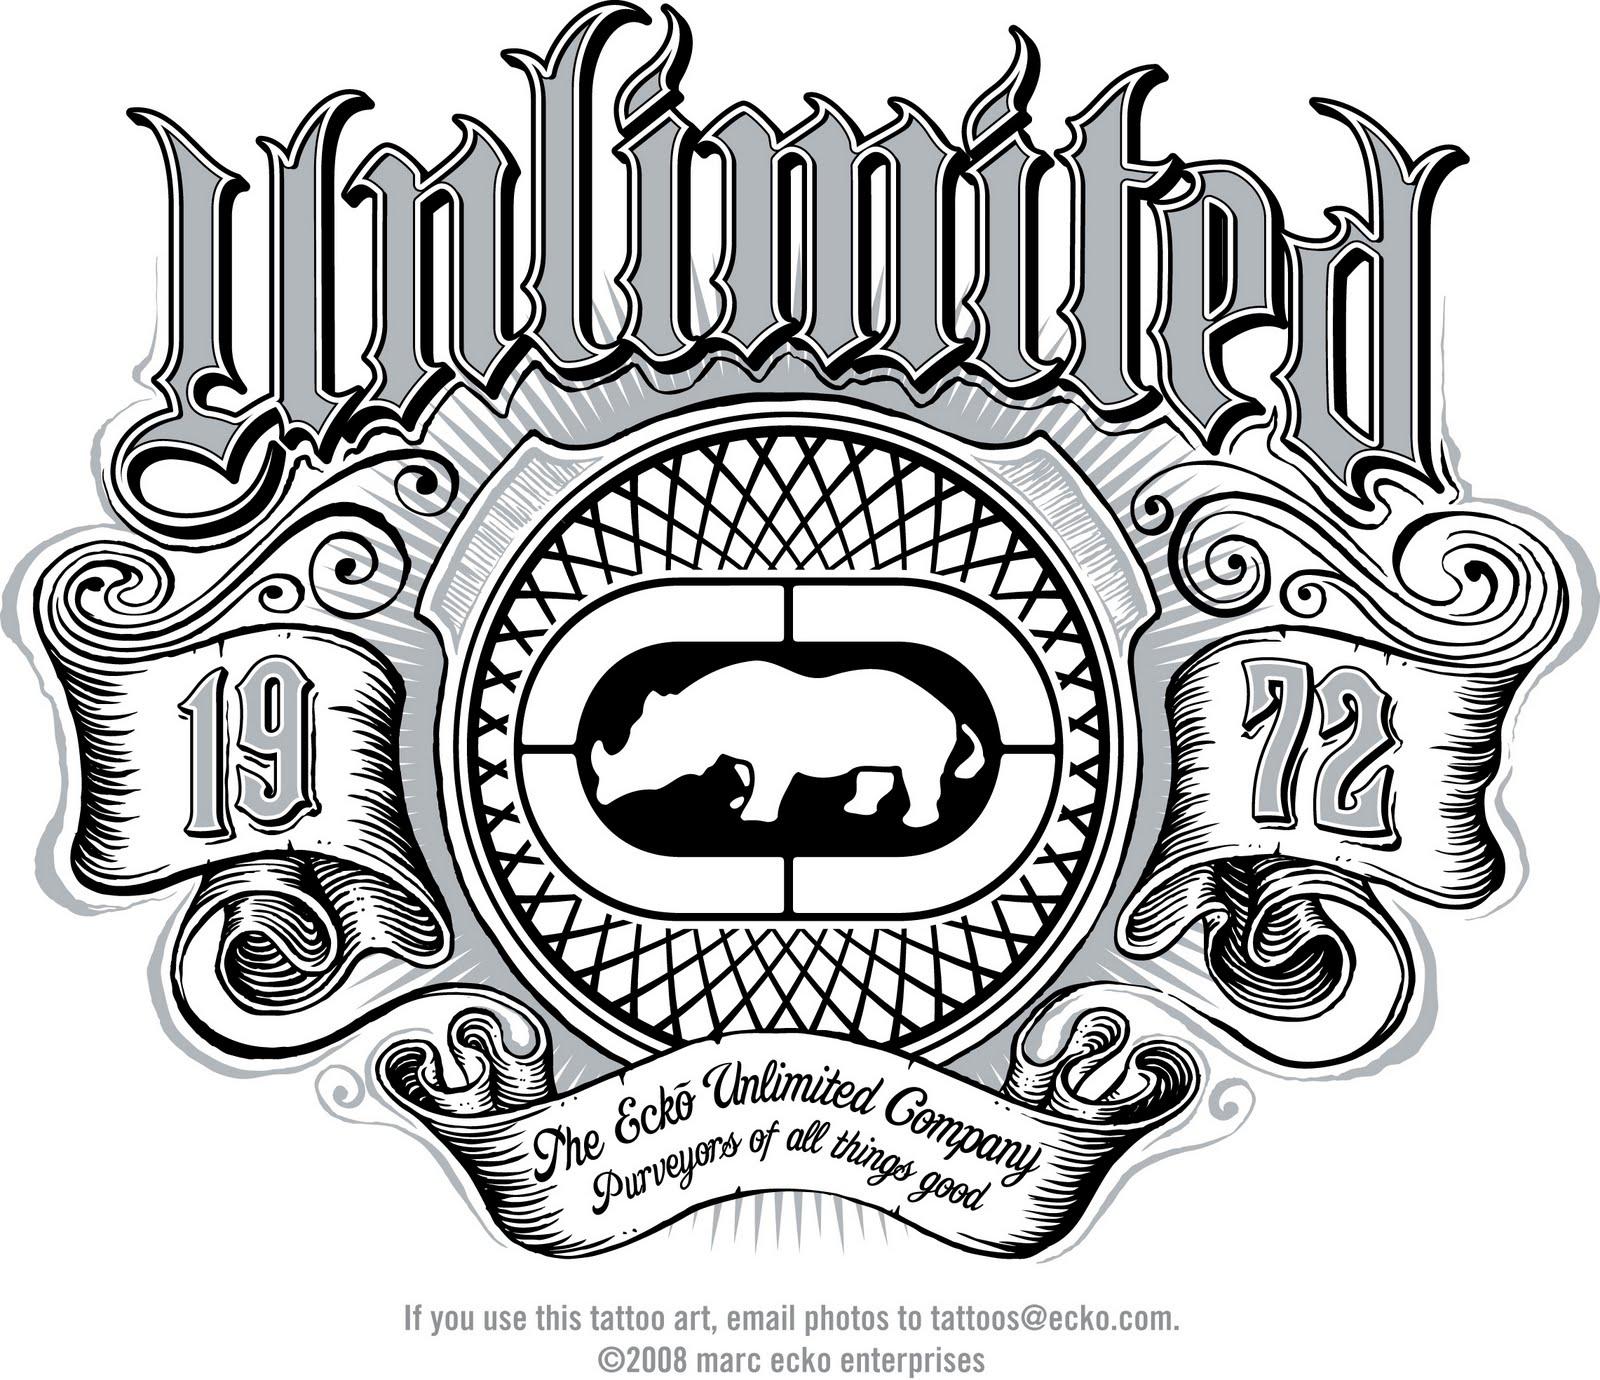 http://4.bp.blogspot.com/_LY8cxvZzt78/S8PKROomGgI/AAAAAAAAABs/WJfjxEFiBws/s1600/ecko_unltd_tattoo-201.jpg